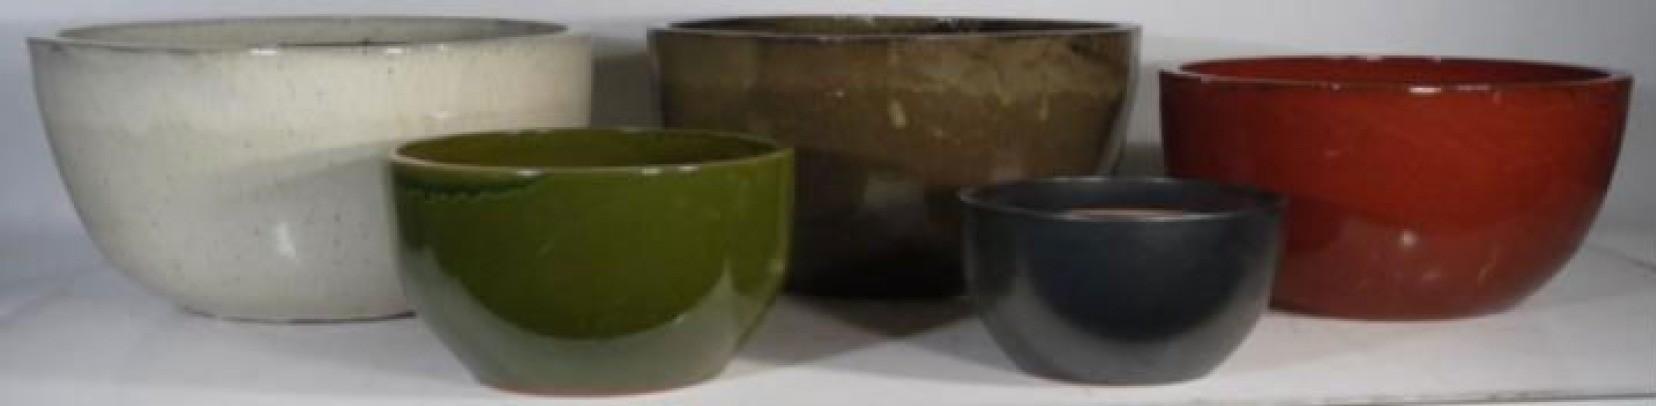 Copper Color Ht 17'' Glazed Ceramic Planter